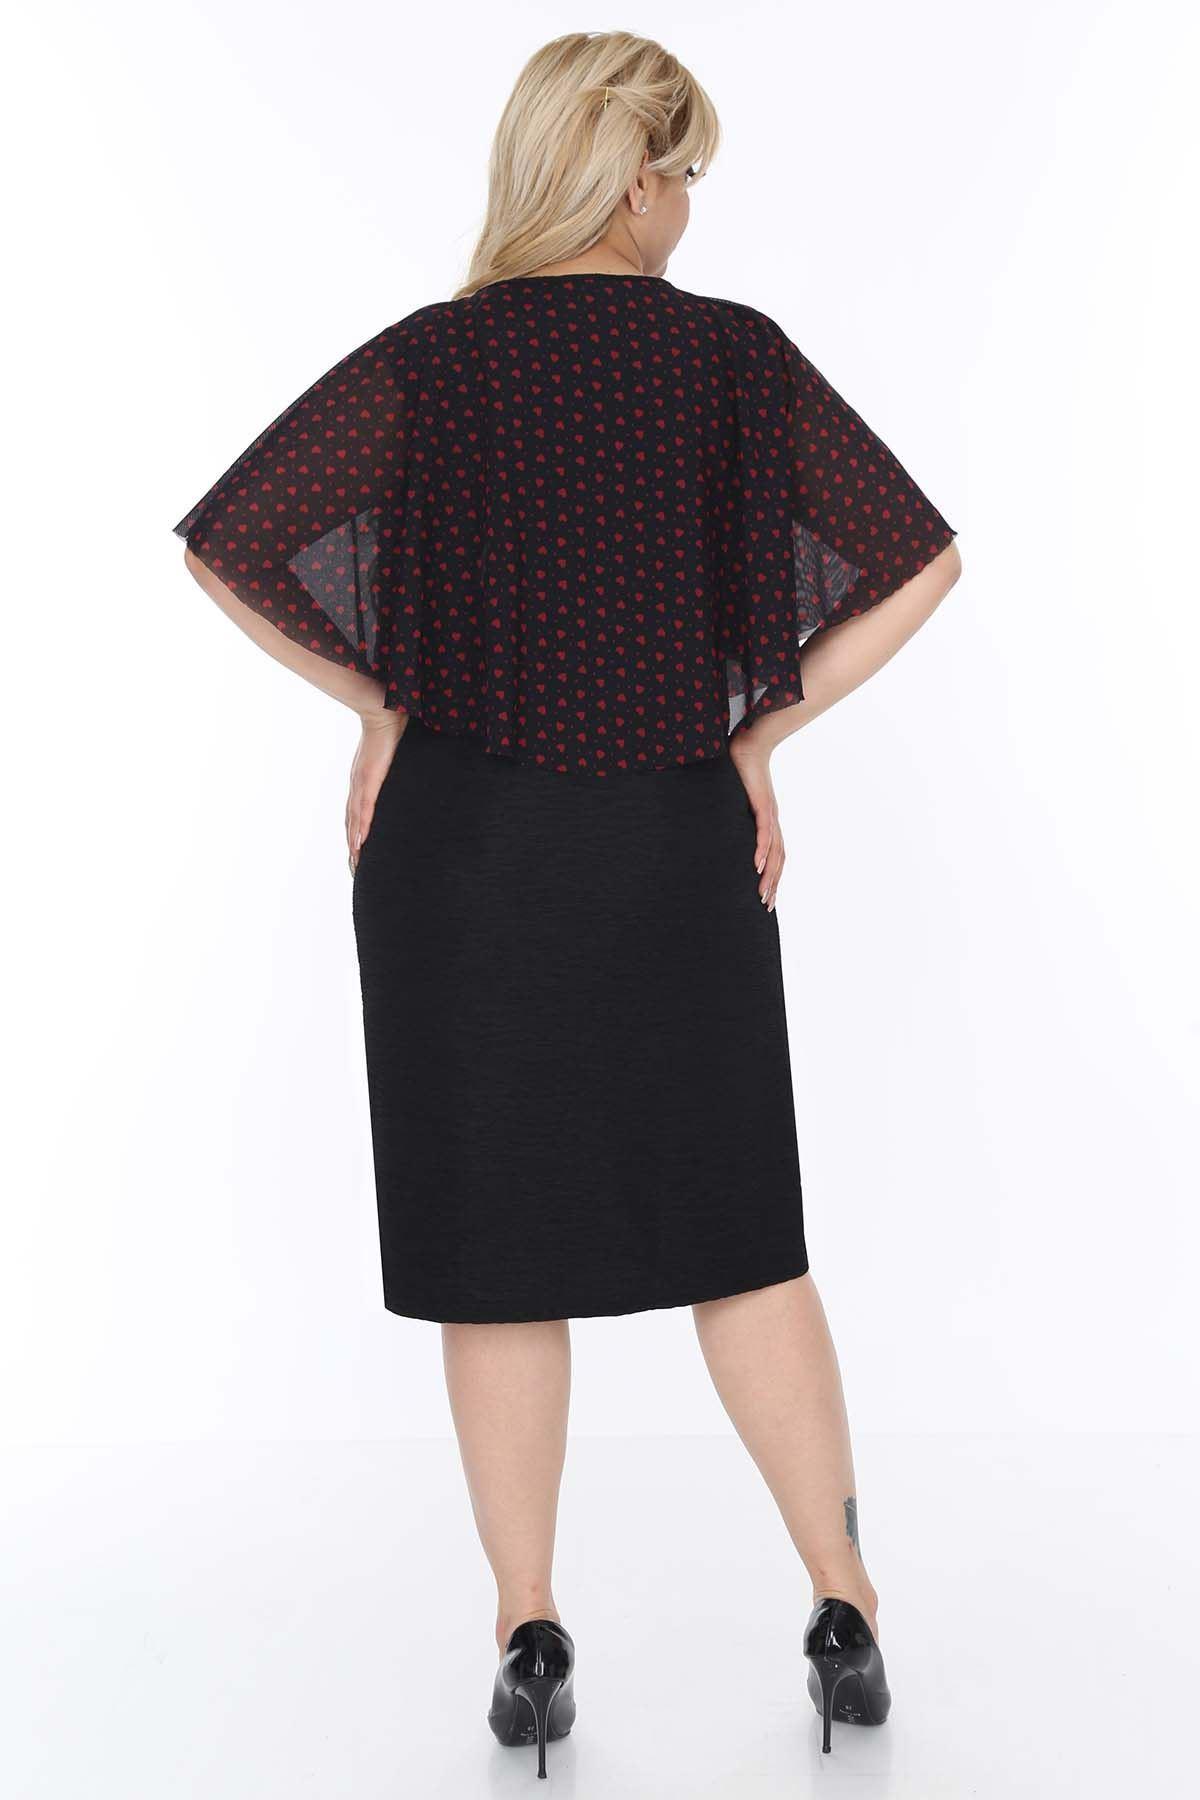 Kalpli Desenli Siyah Elbise 20L-0505